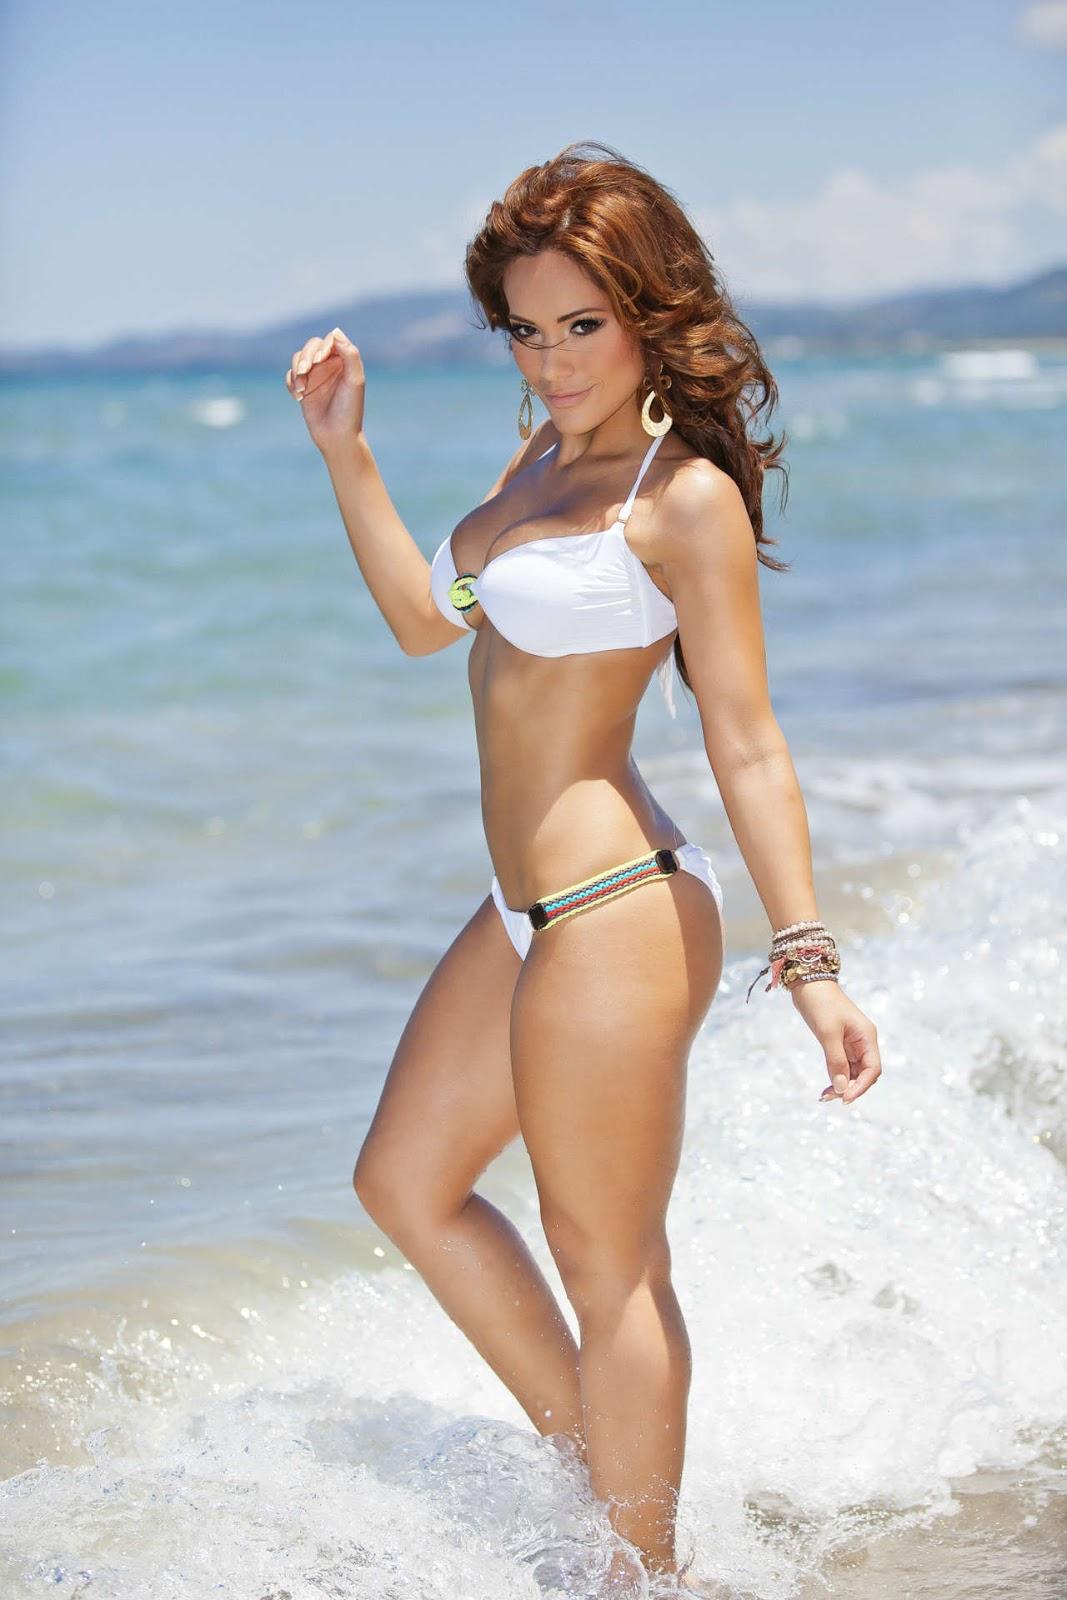 reaganite independent miss honduras 2012 is jennifer andrade